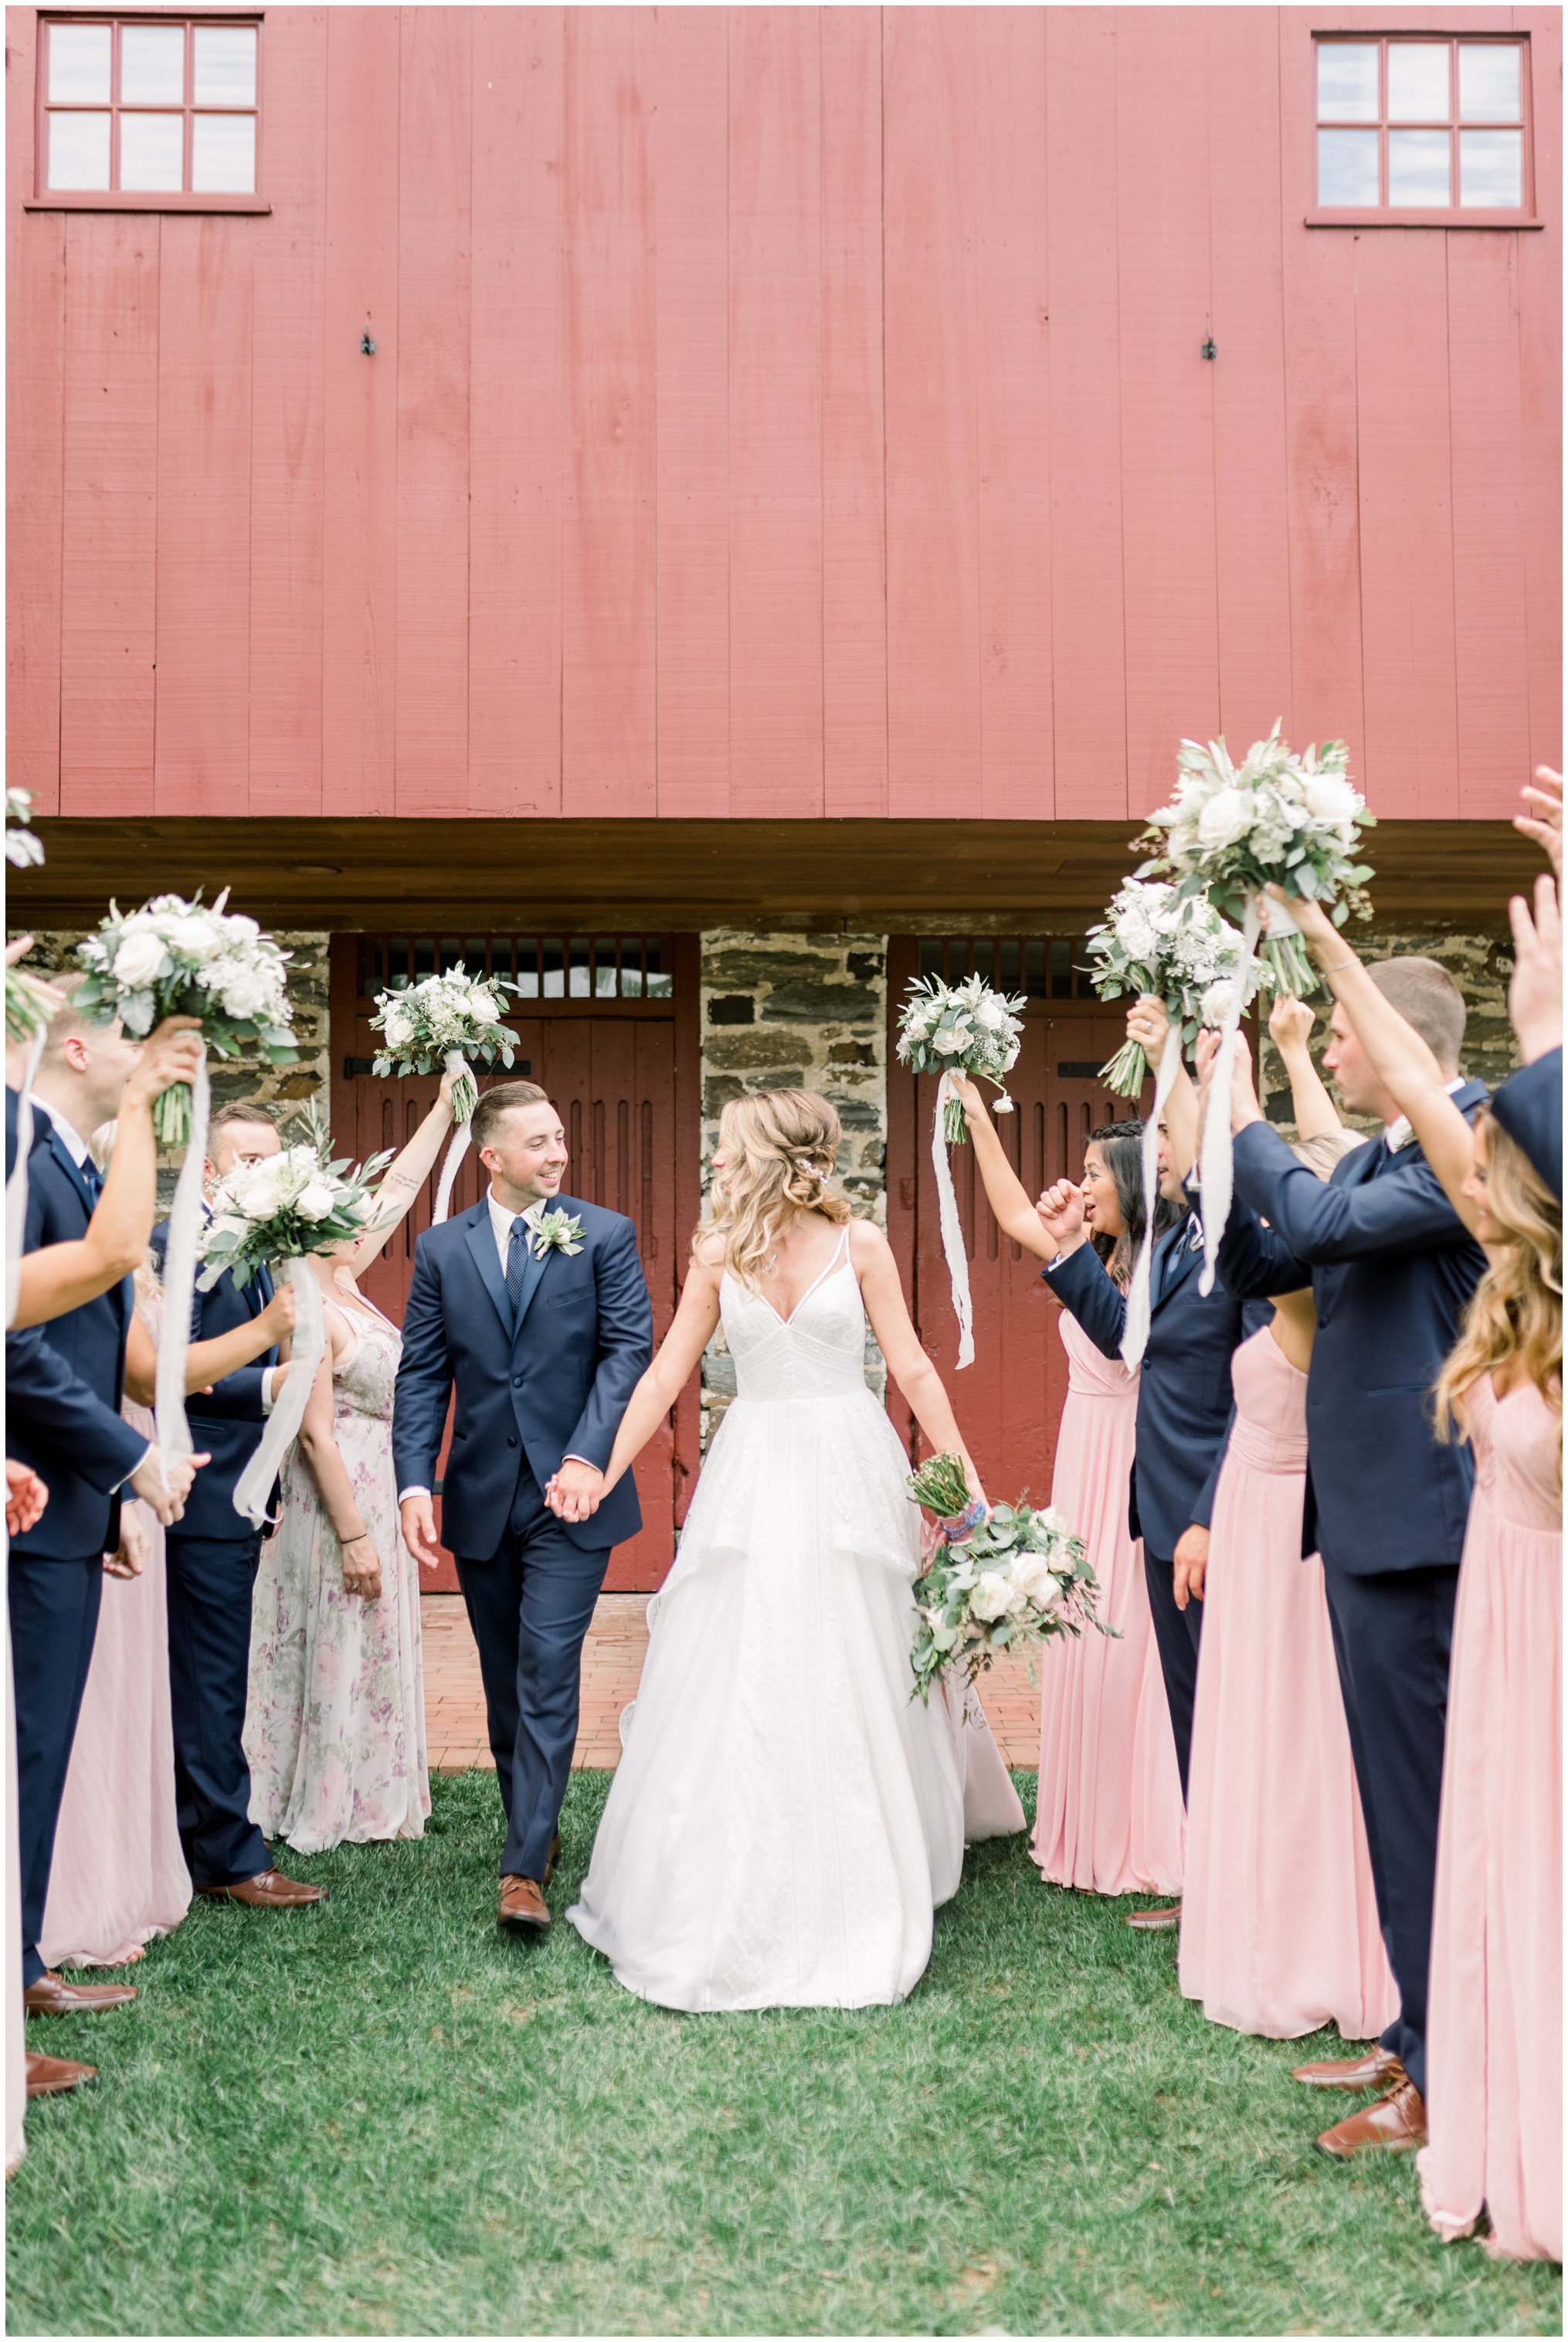 Krista Brackin Photography | July Wedding at The Farm at Eagle's Ridge_0019.jpg